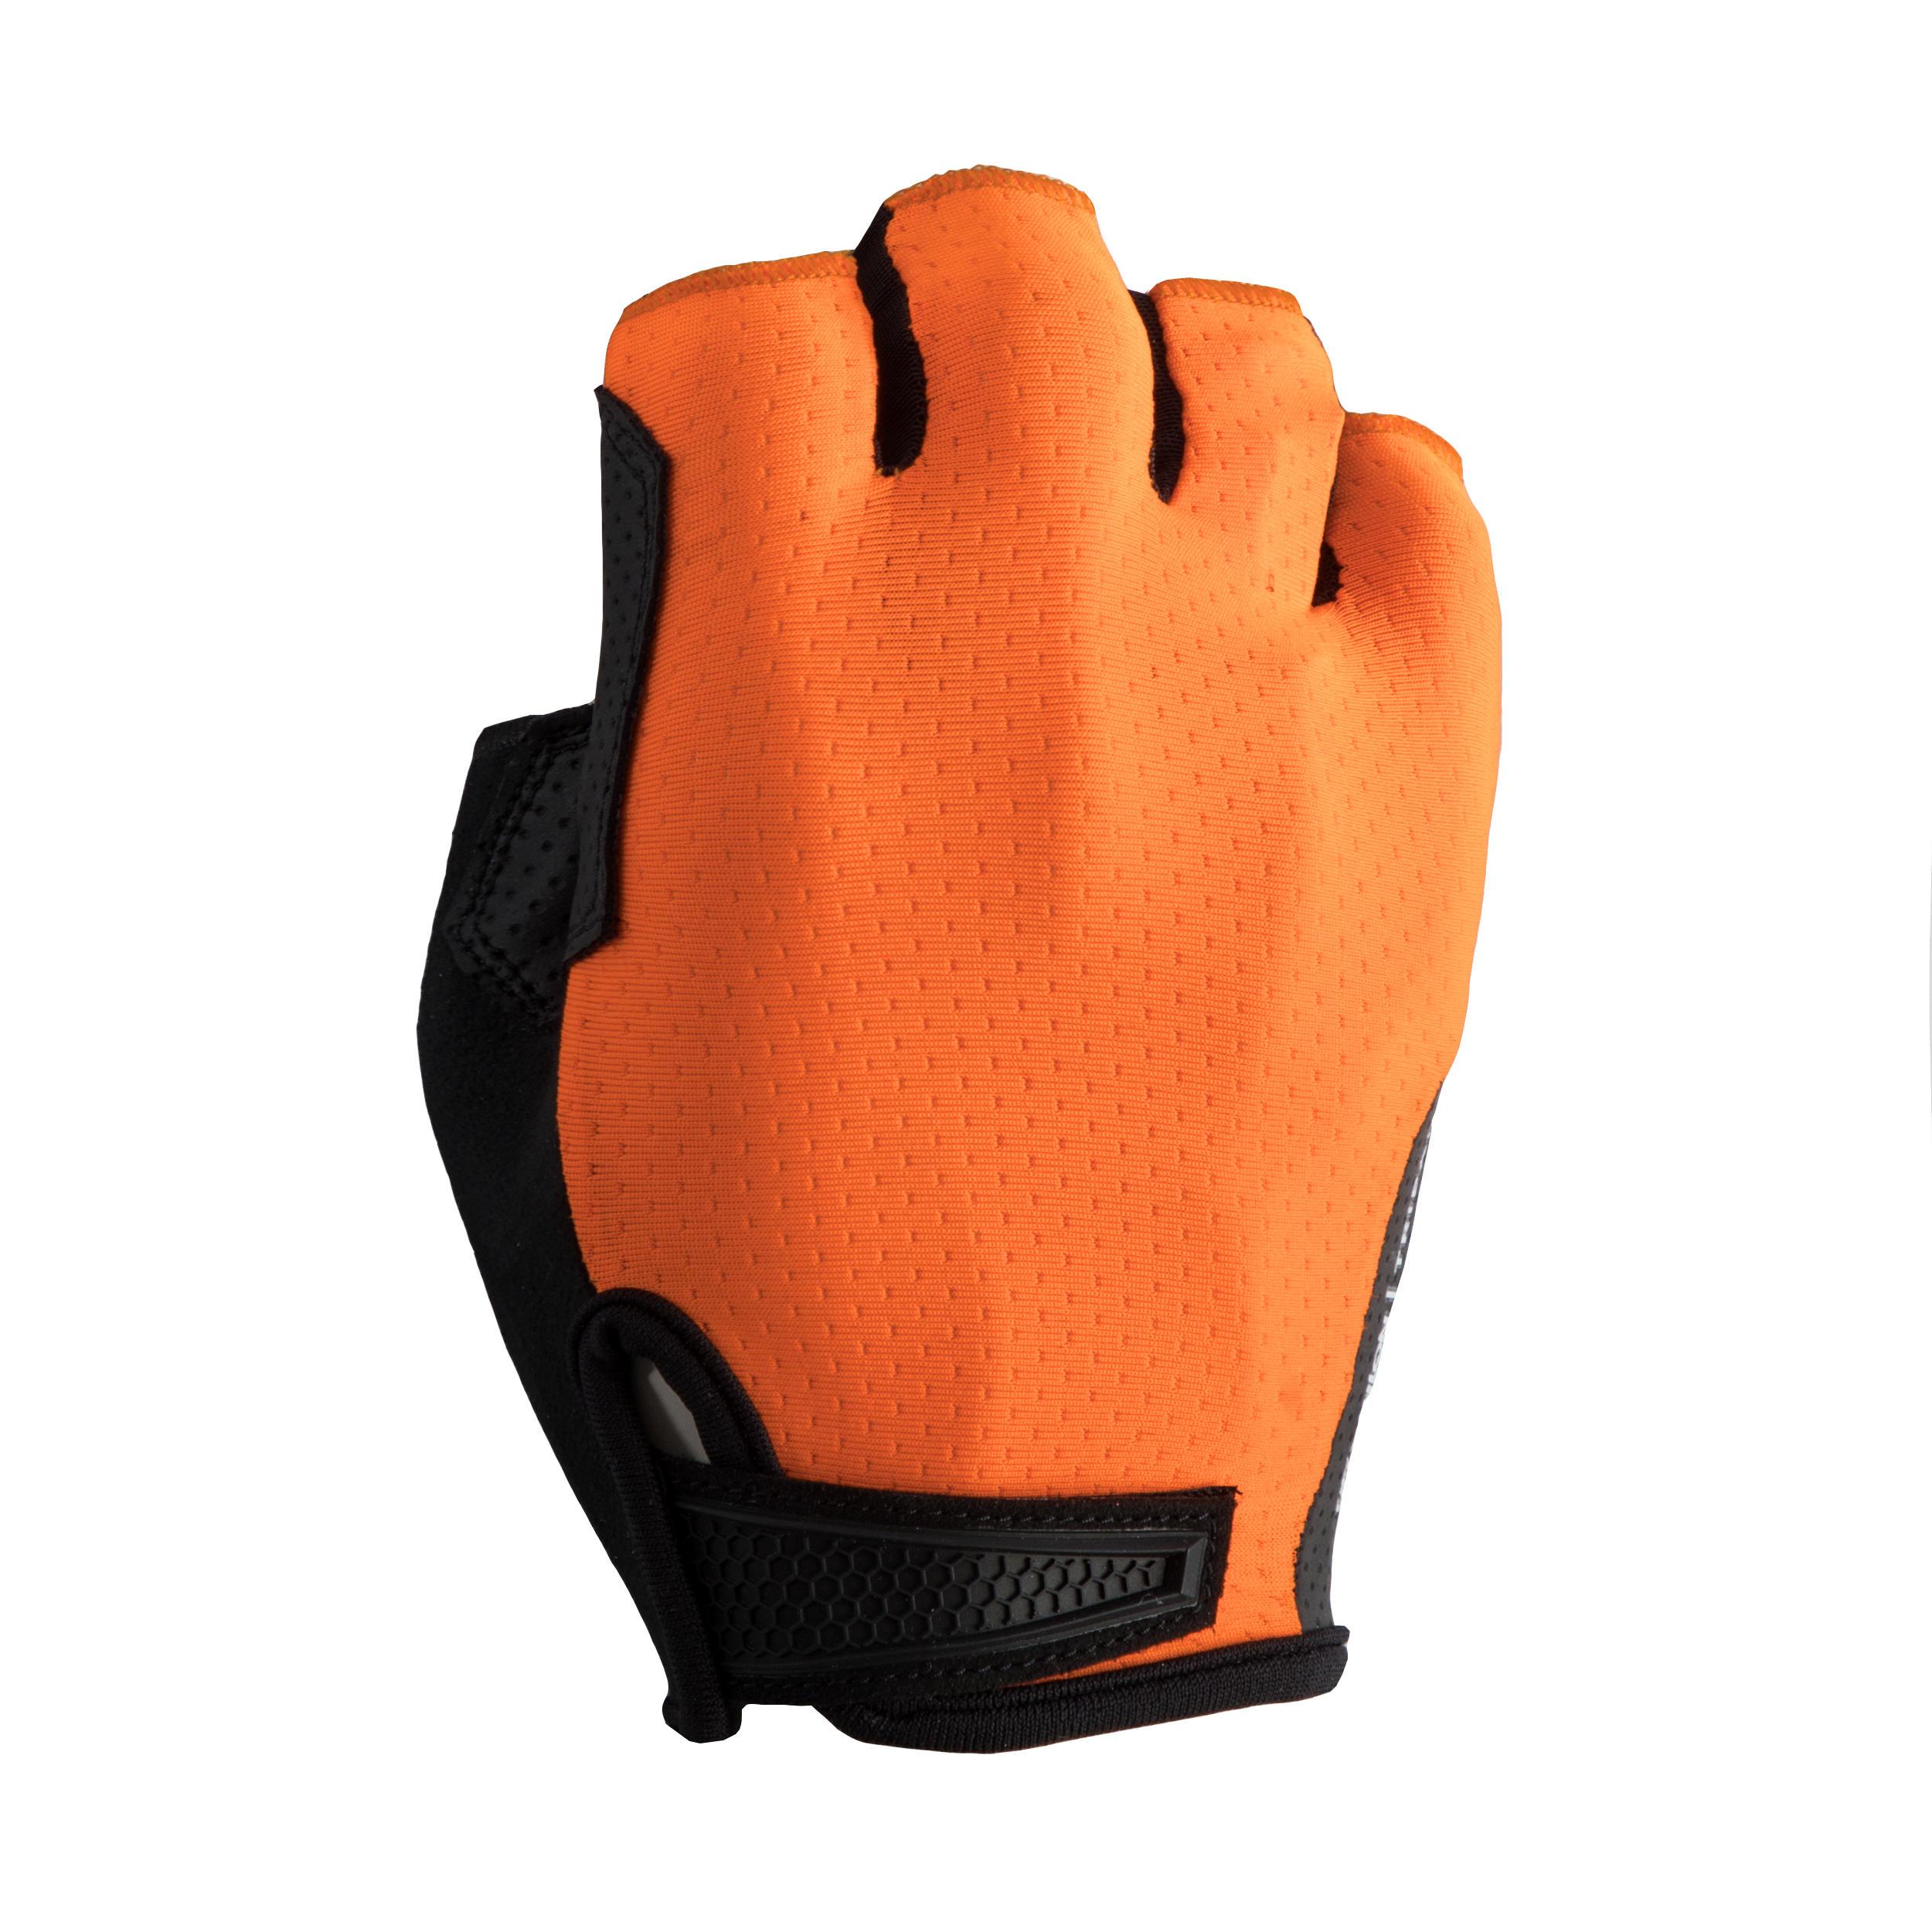 Triban Wielrenhandschoenen RC900 fluo oranje